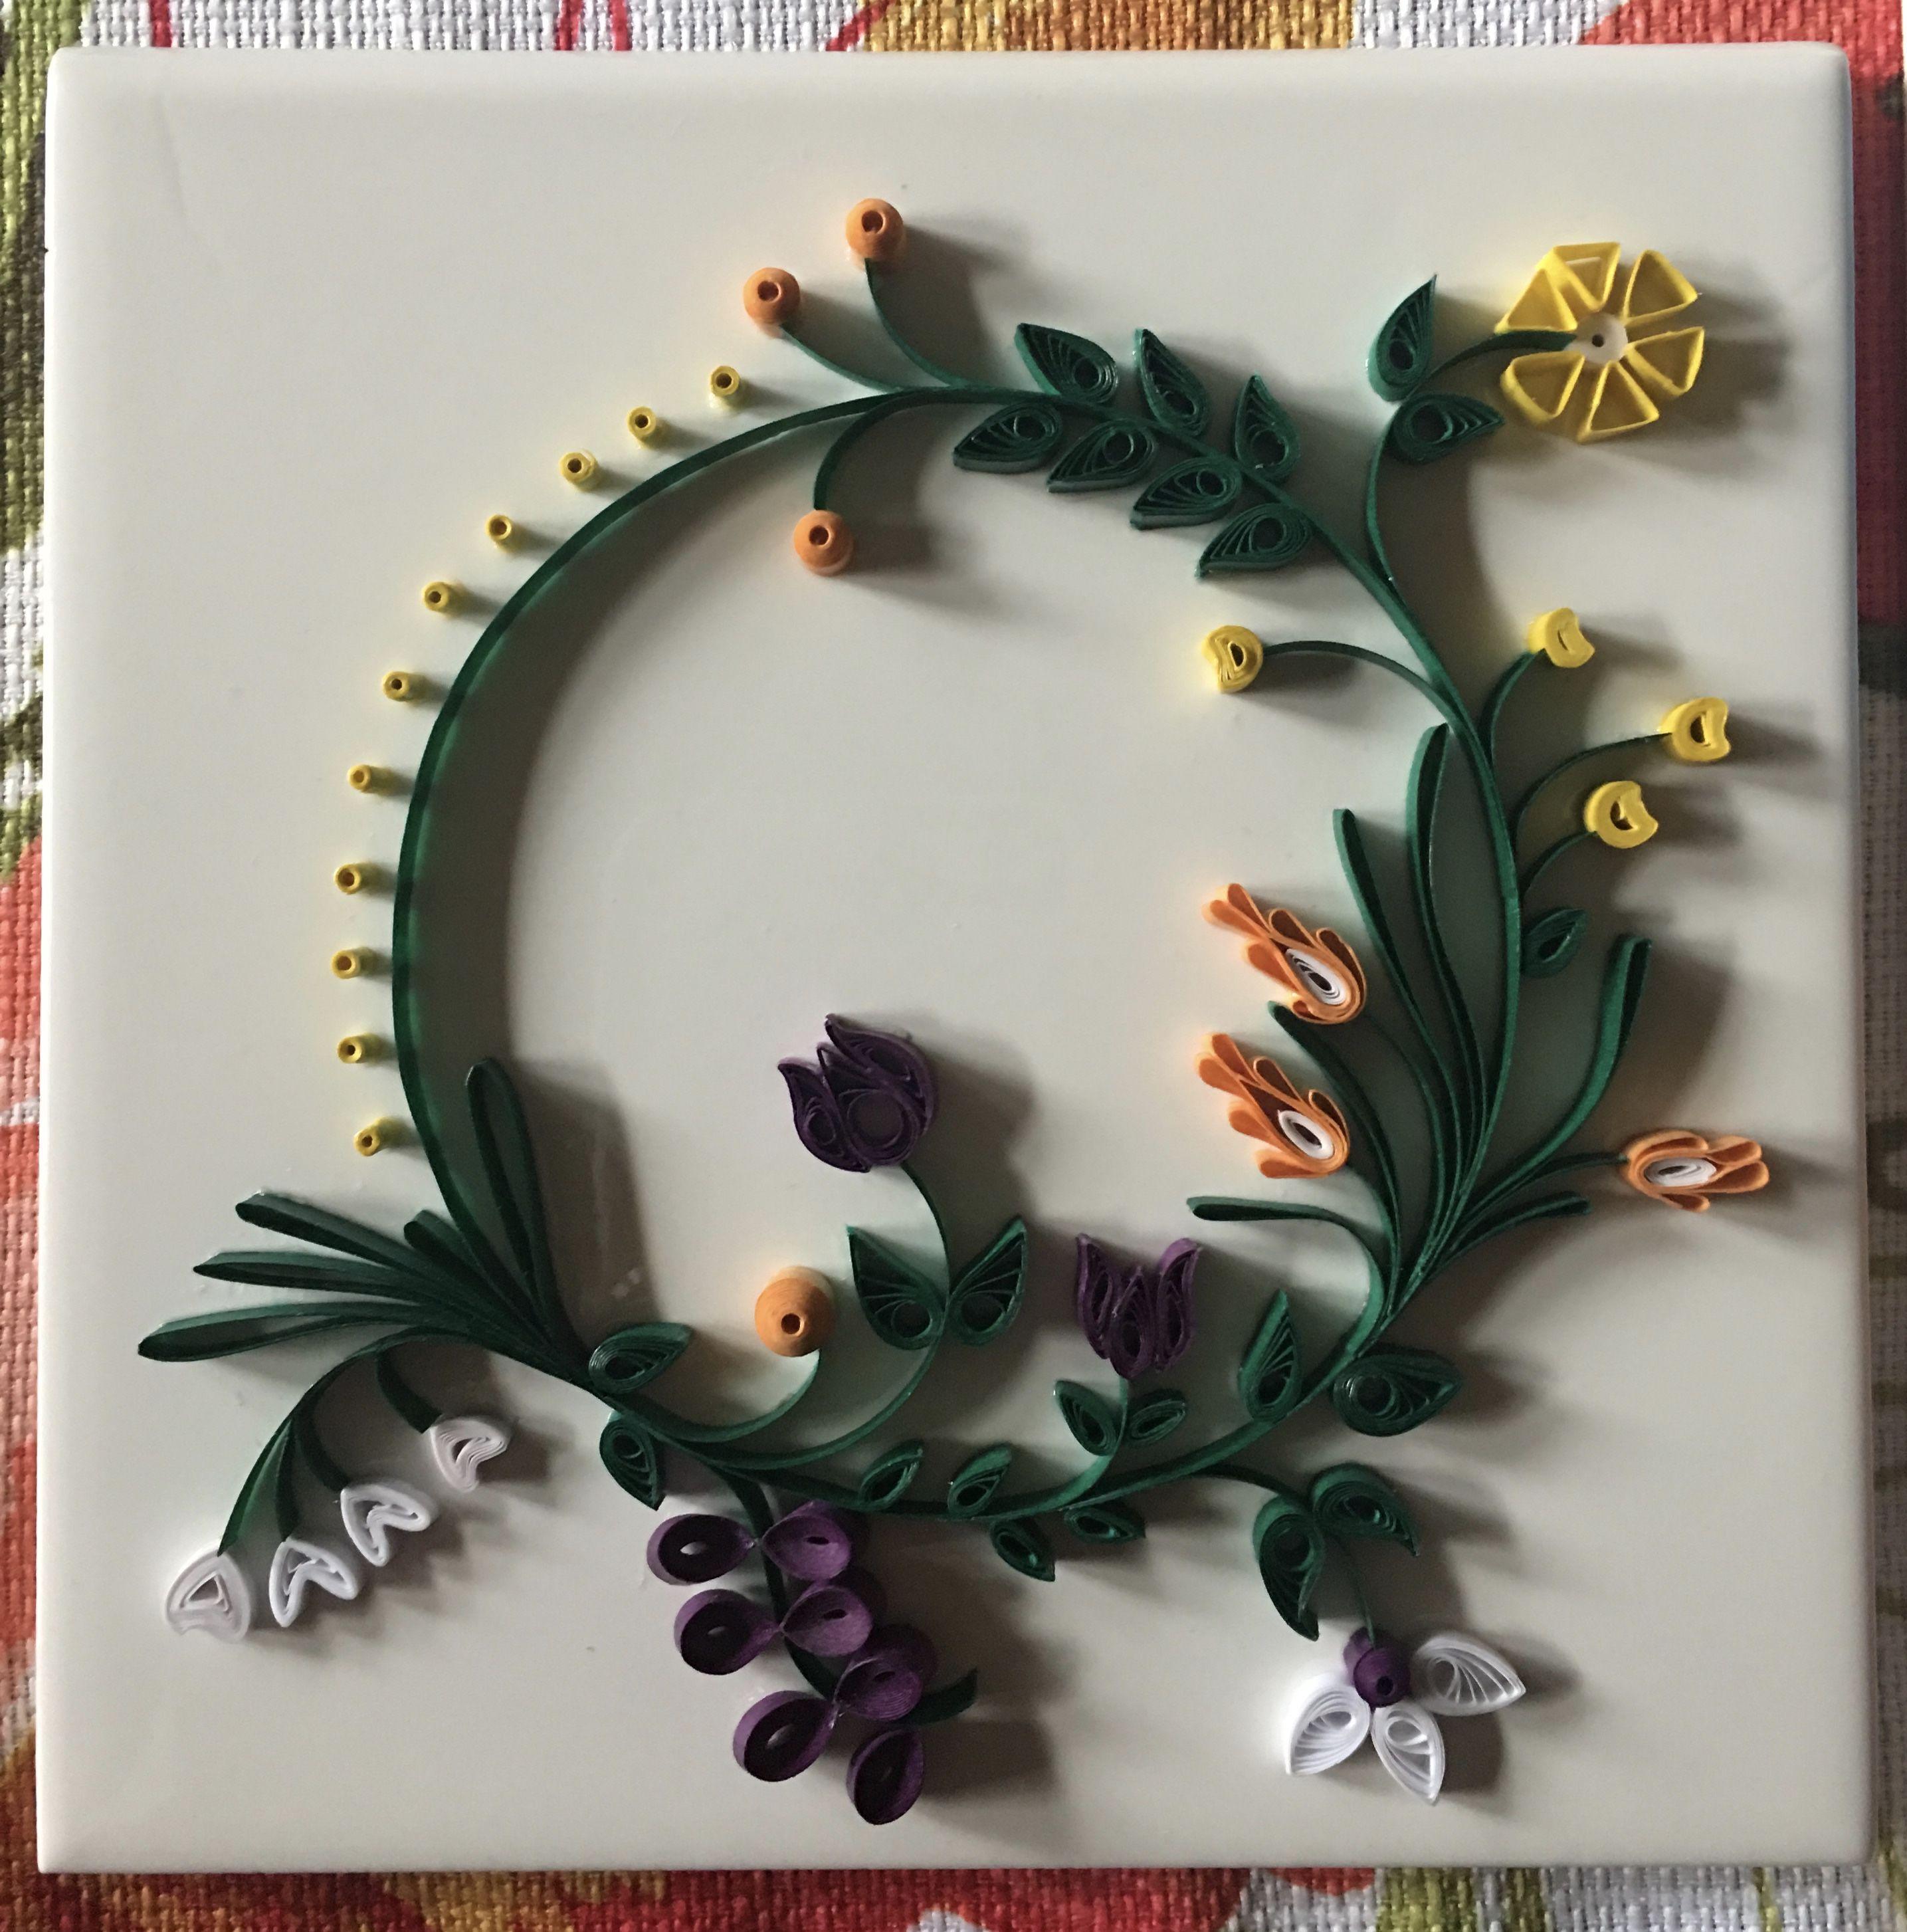 Paper Quilling Flower Wreath By Lauren Byrne @PickerElite | Quilling ...